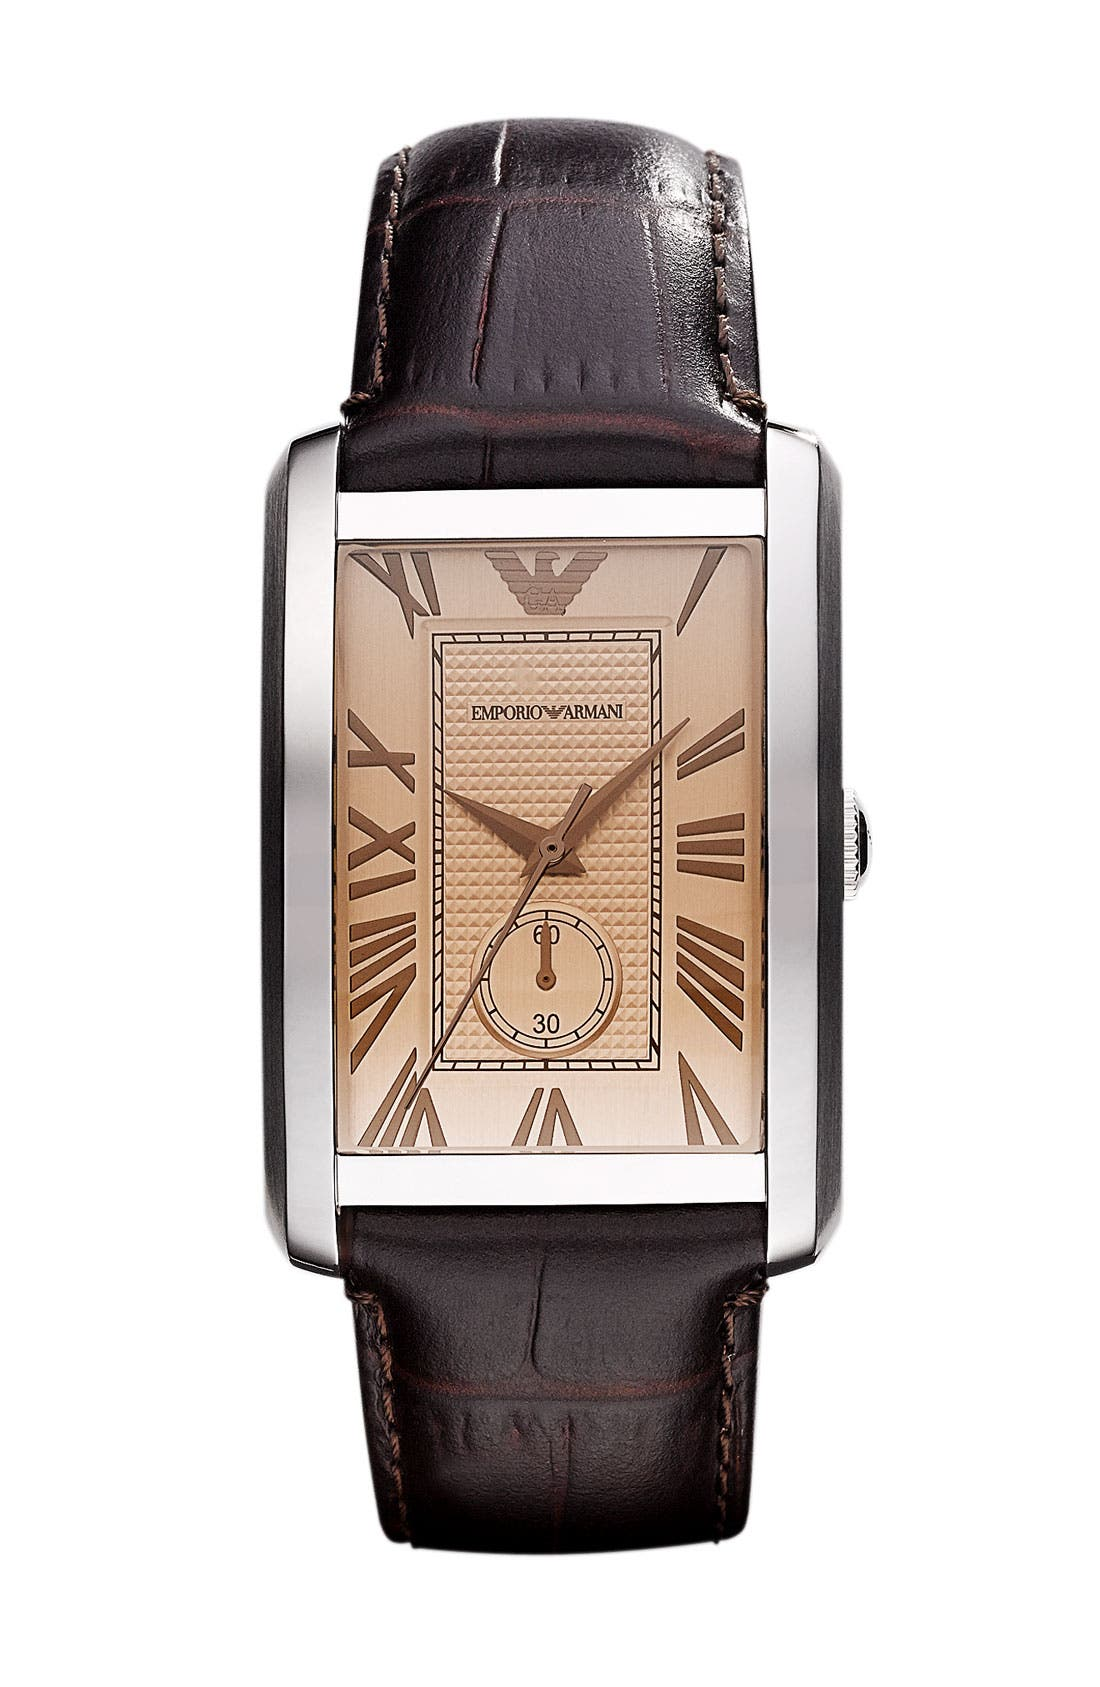 Main Image - Emporio Armani 'Classic - Large' Rectangular Dial Watch, 31mm x 39mm